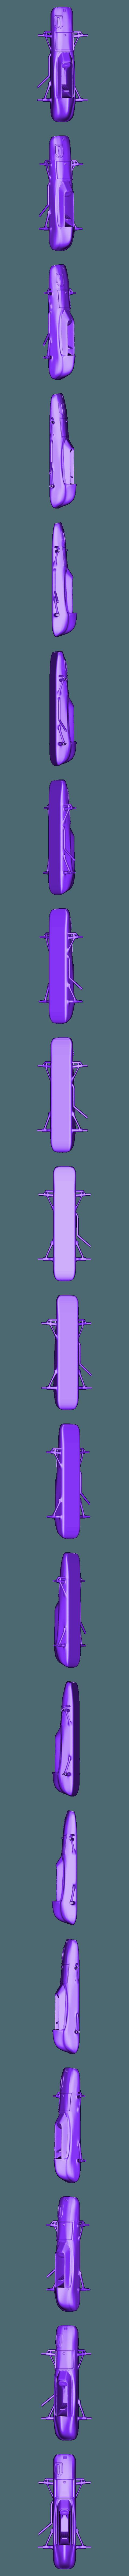 Saab Formula Body.STL Download free STL file Vintage race car (Saab formula) • 3D printer model, skofictadej287